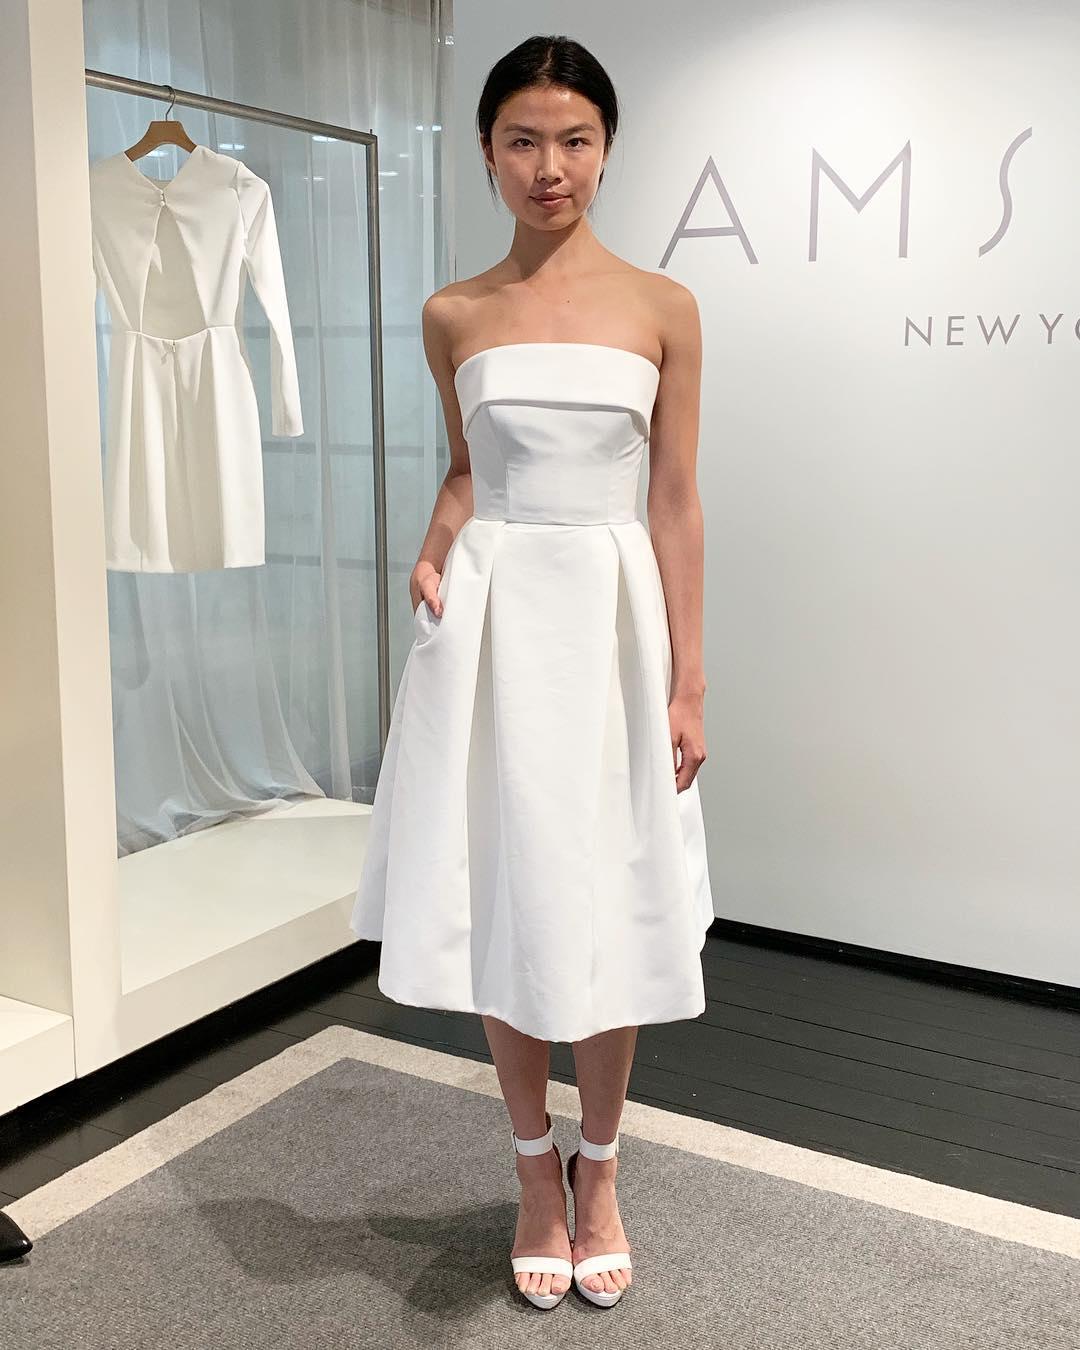 b28b00e0653 Simple Strapless Short White Wedding Dress with Pockets · modsele ...